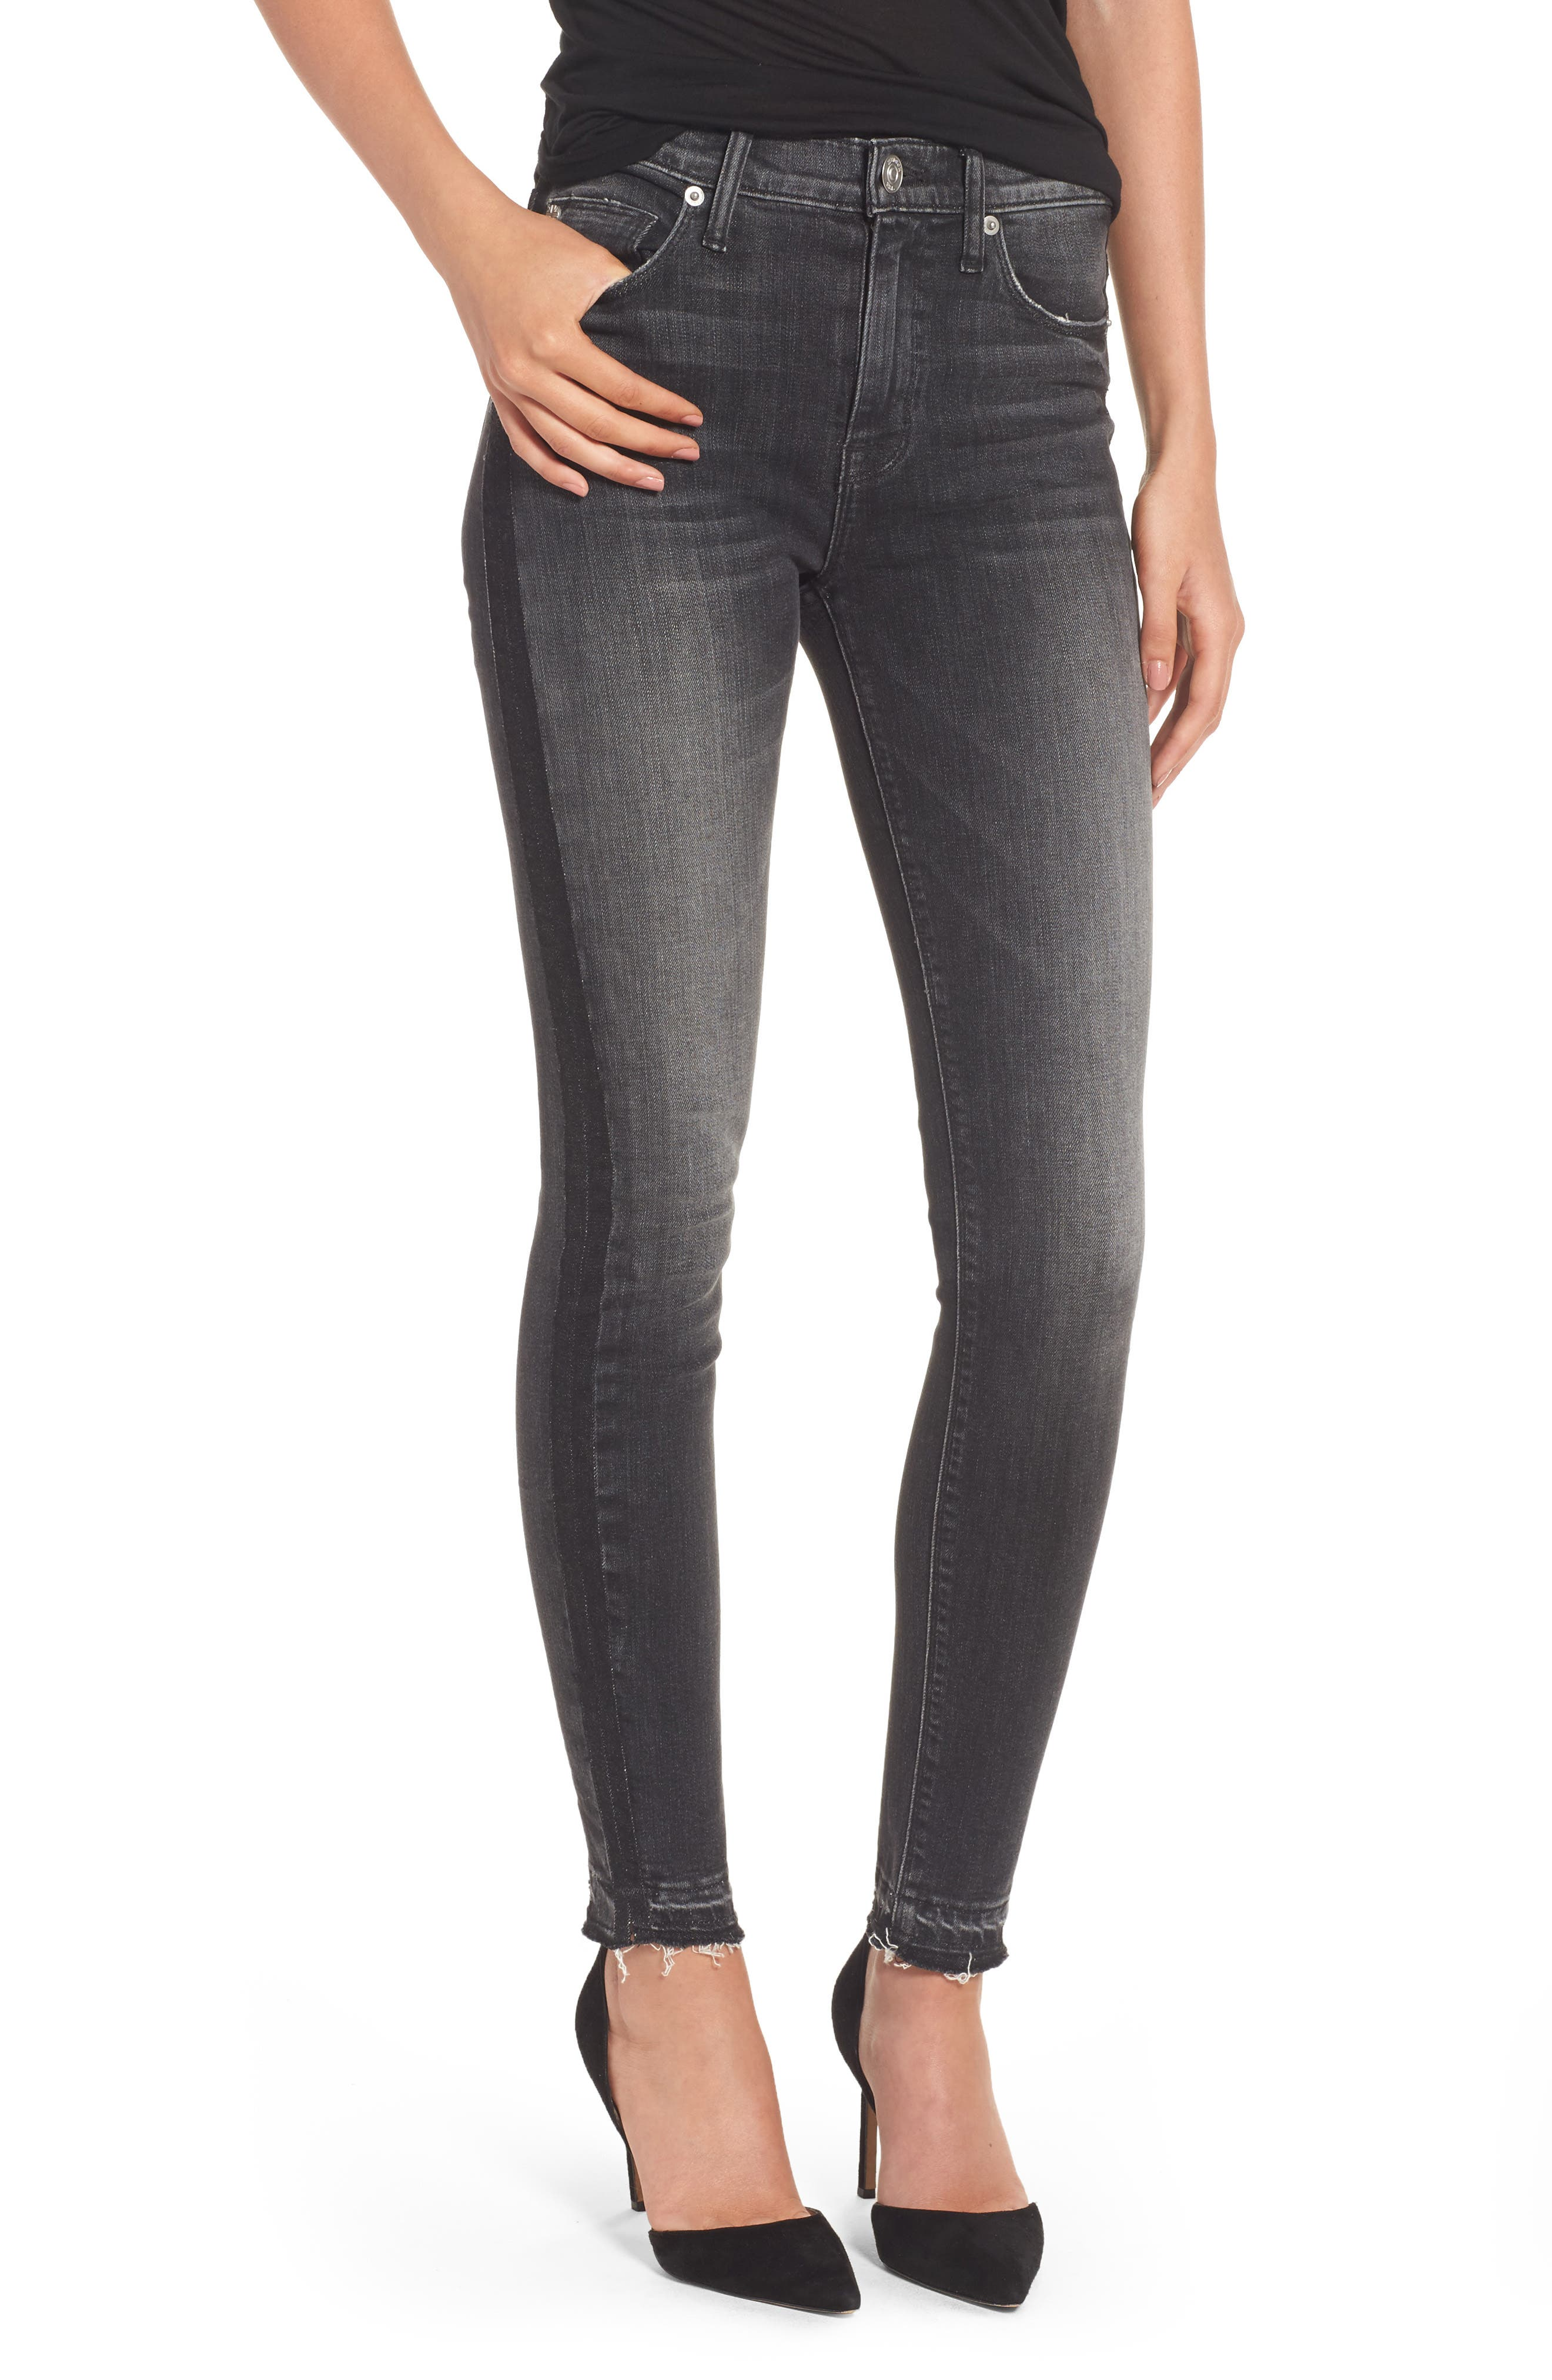 Barbara High Waist Super Skinny Jeans,                         Main,                         color, Onix